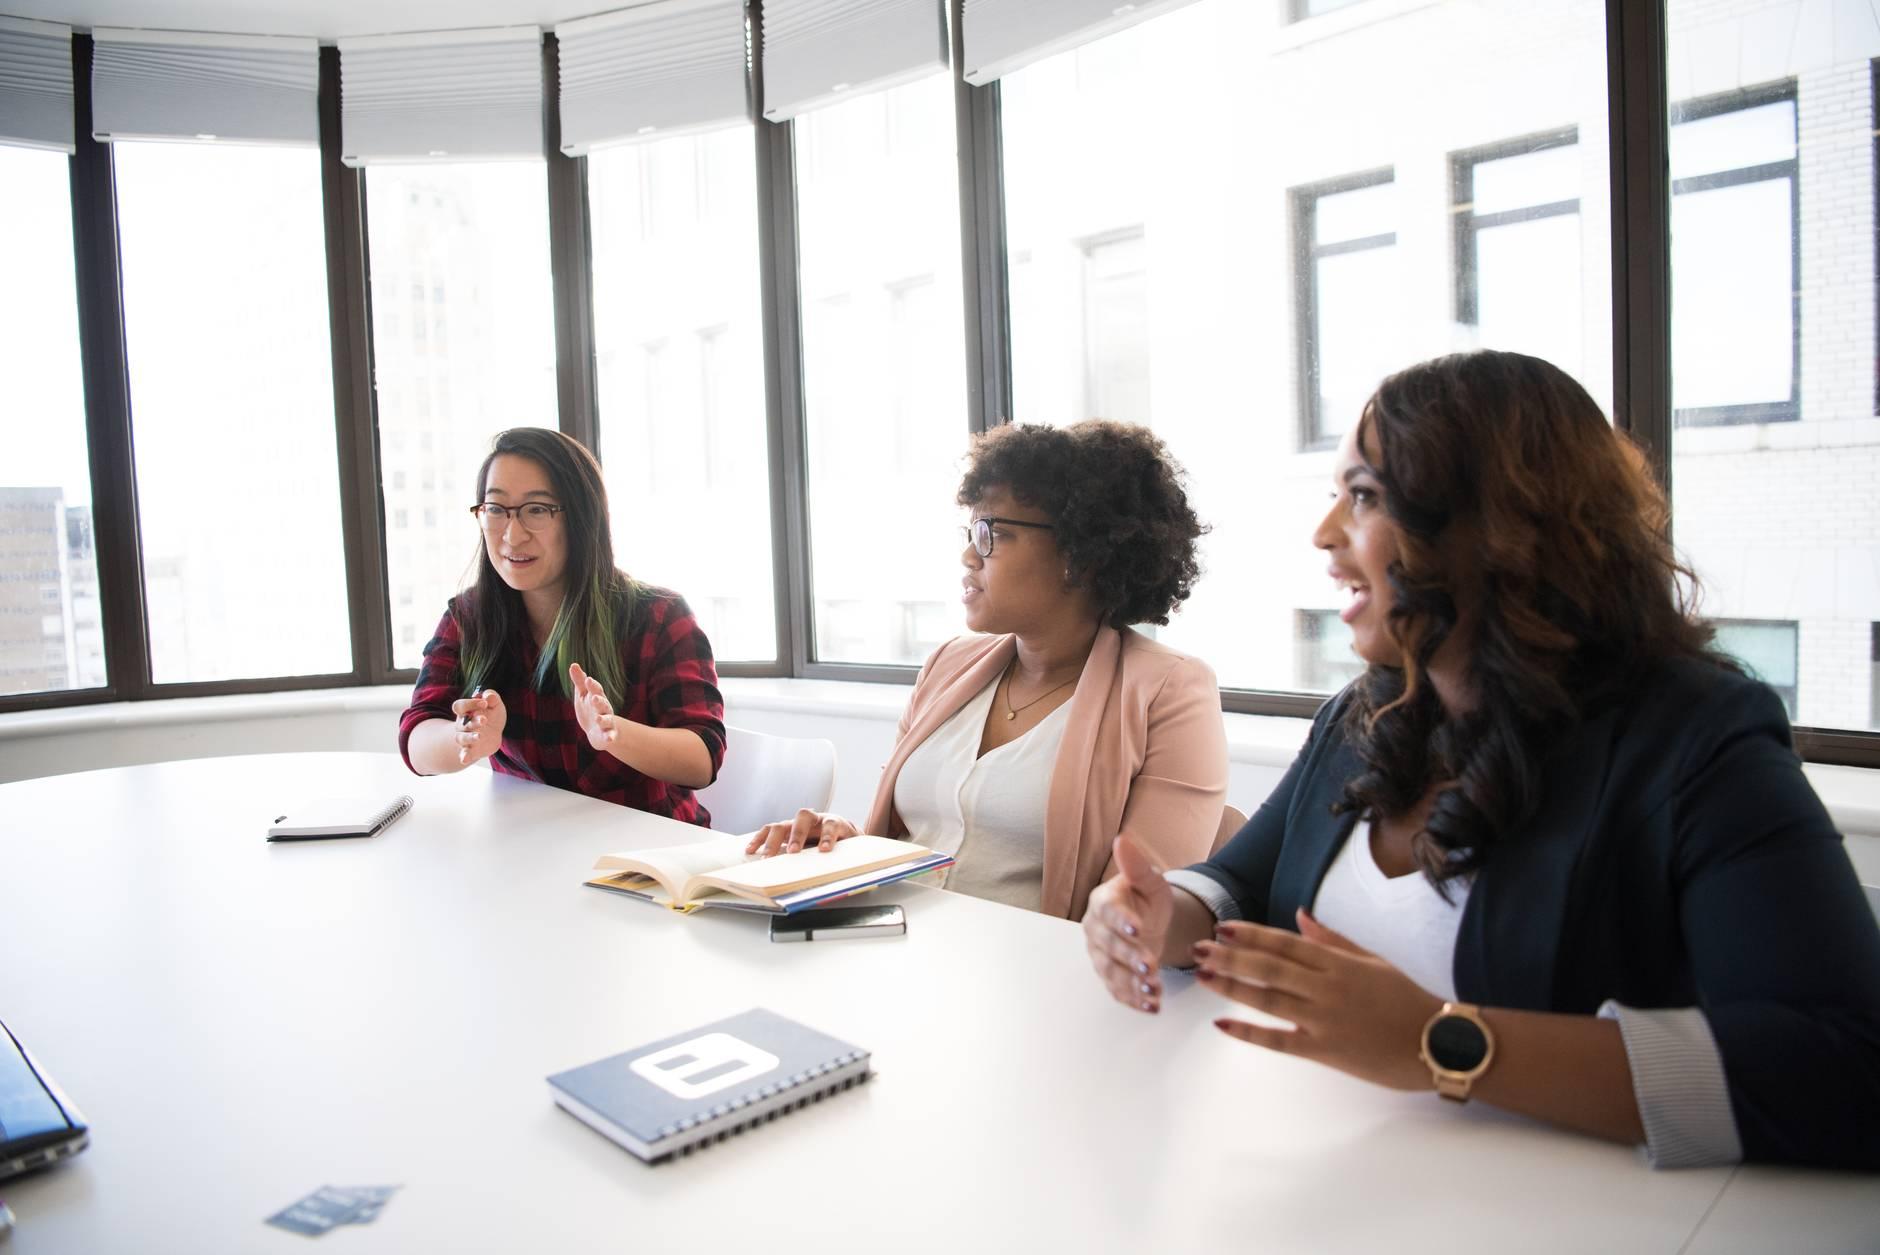 three woman talking near white wooden table inside room